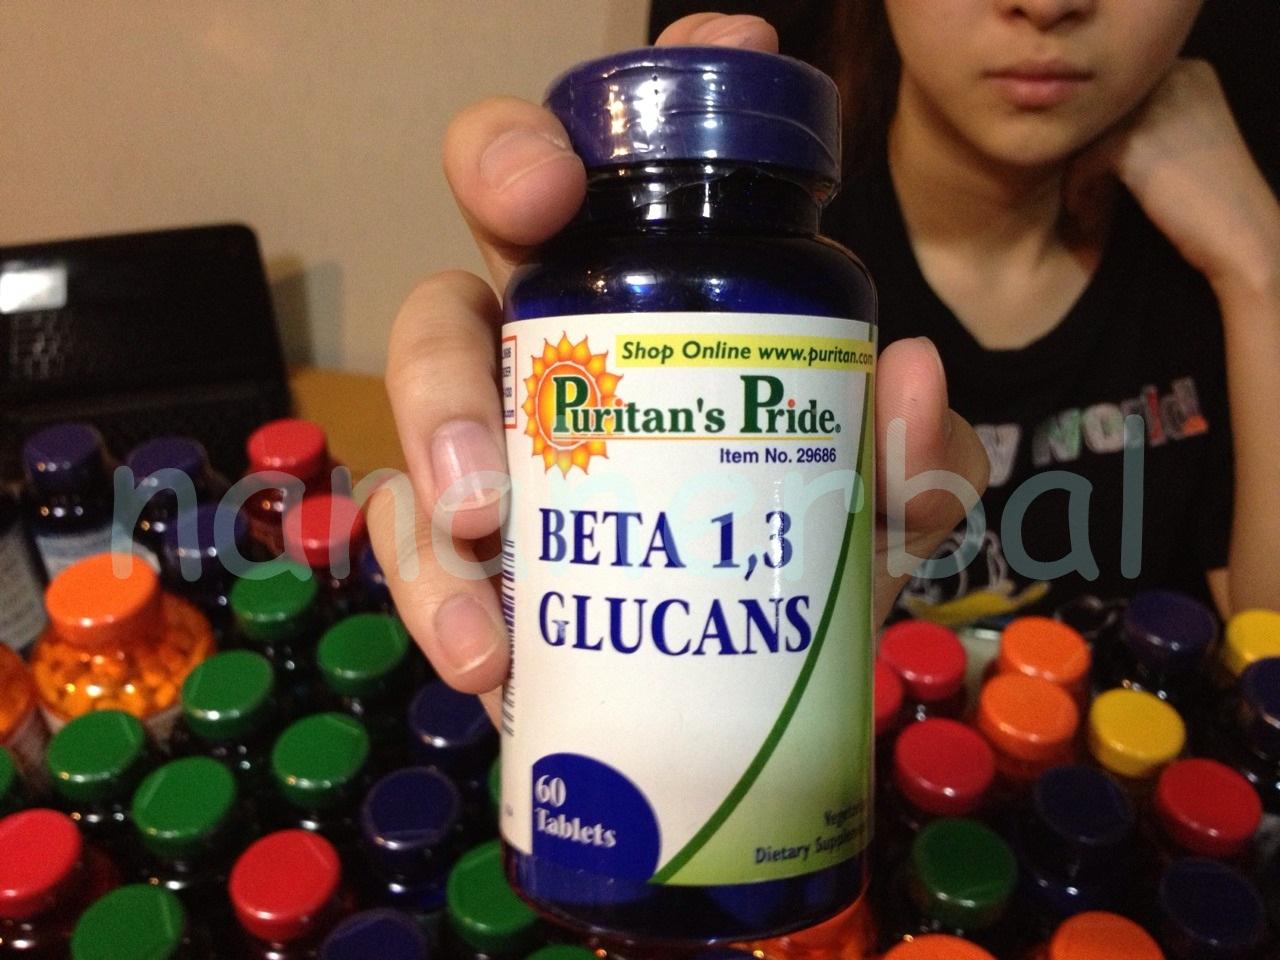 Puritan's Pride Beta 1,3 Glucan 60 tablets